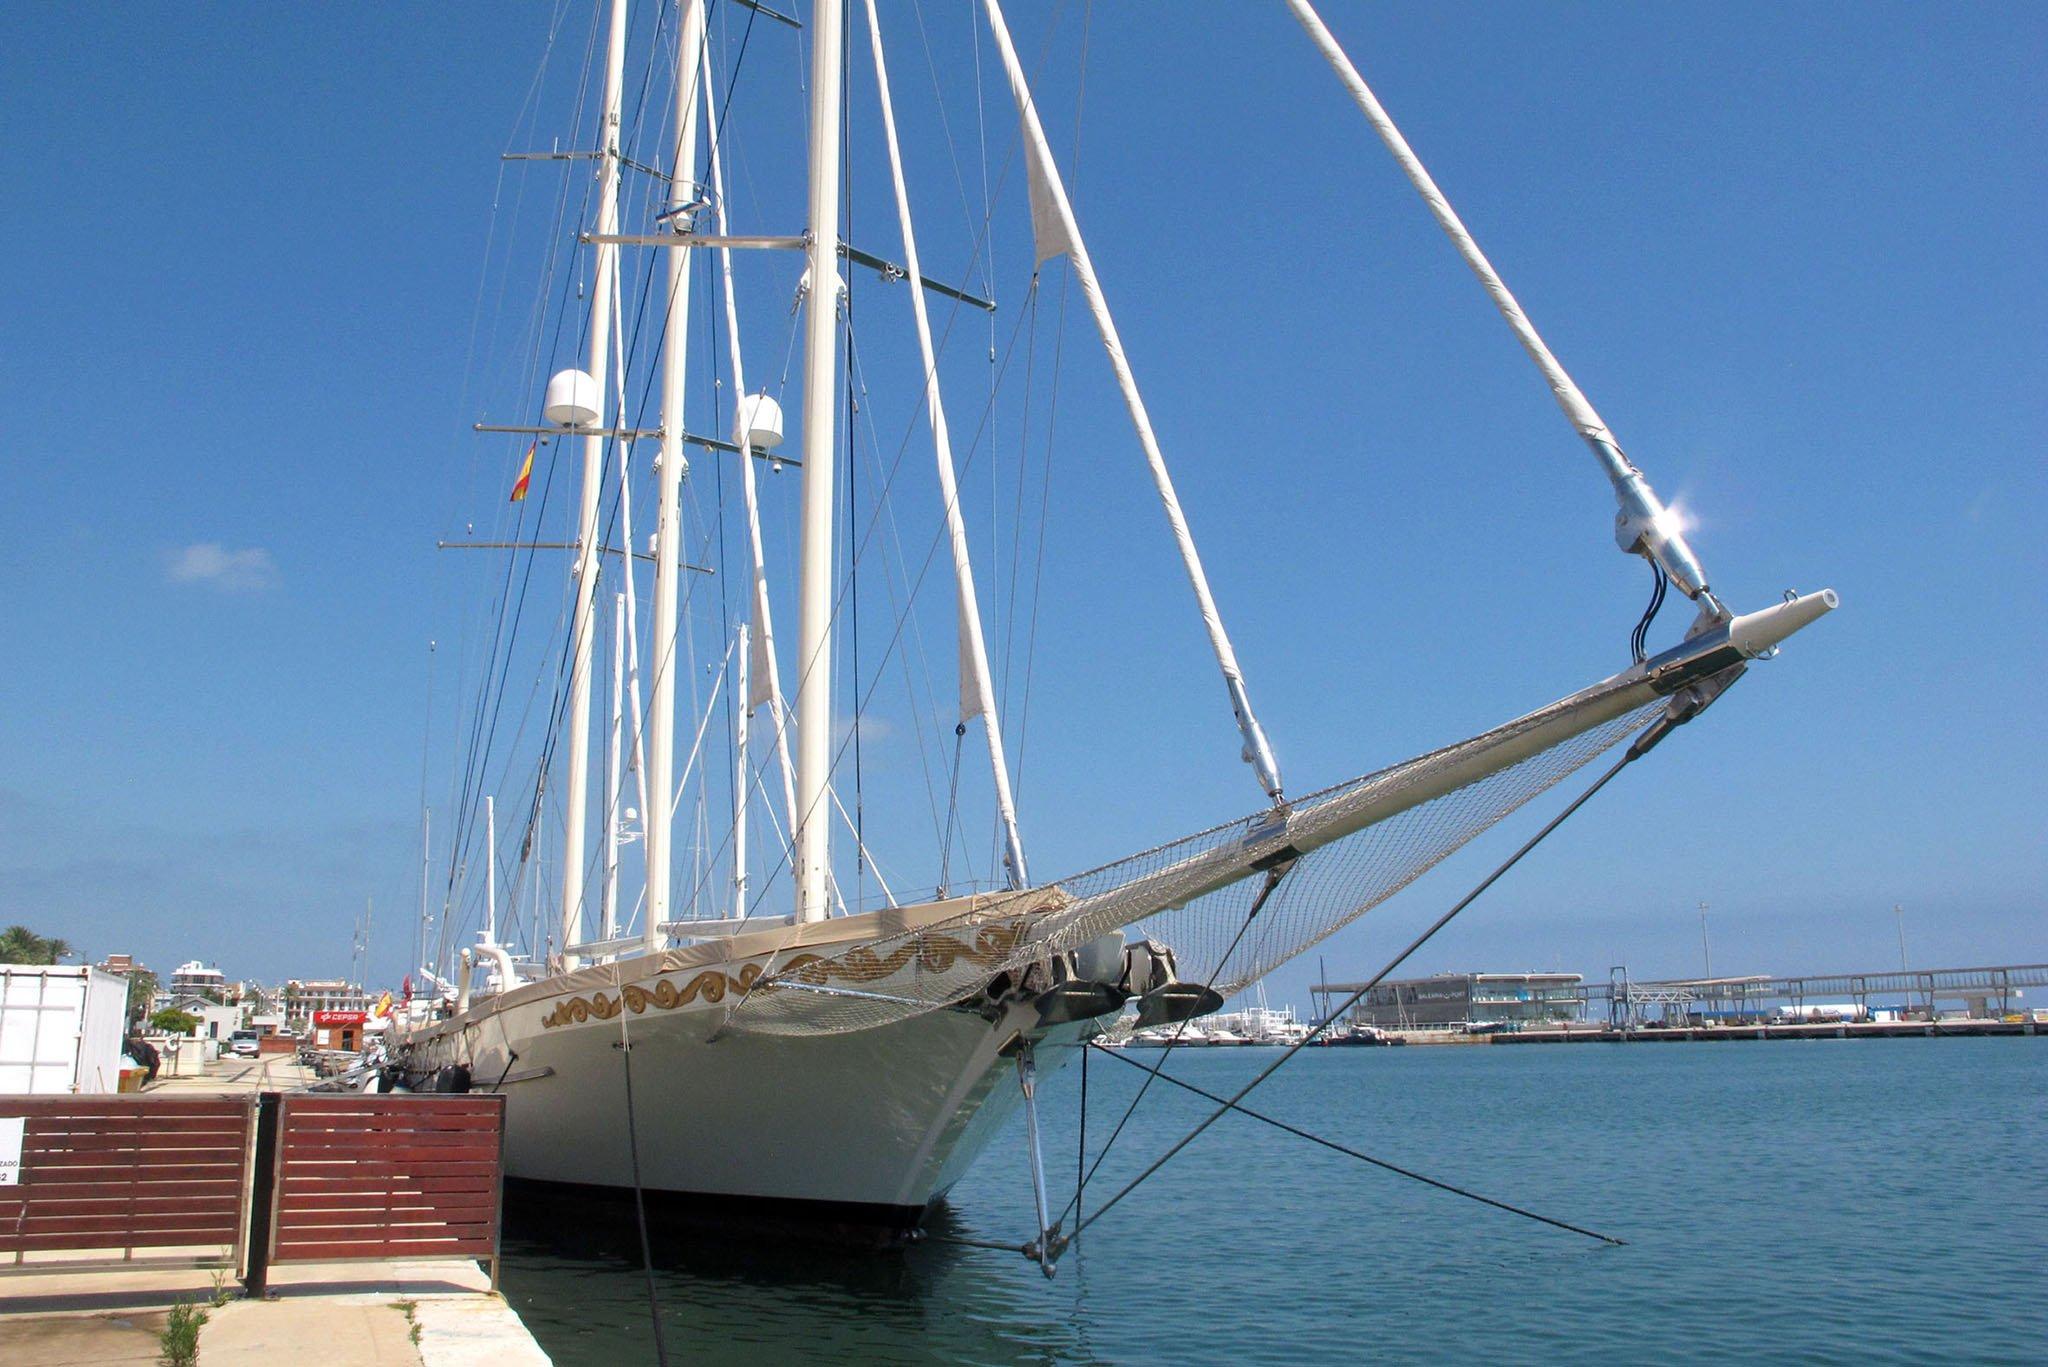 El velero de lujo Mikhail S. Vorontsov en Dénia 02